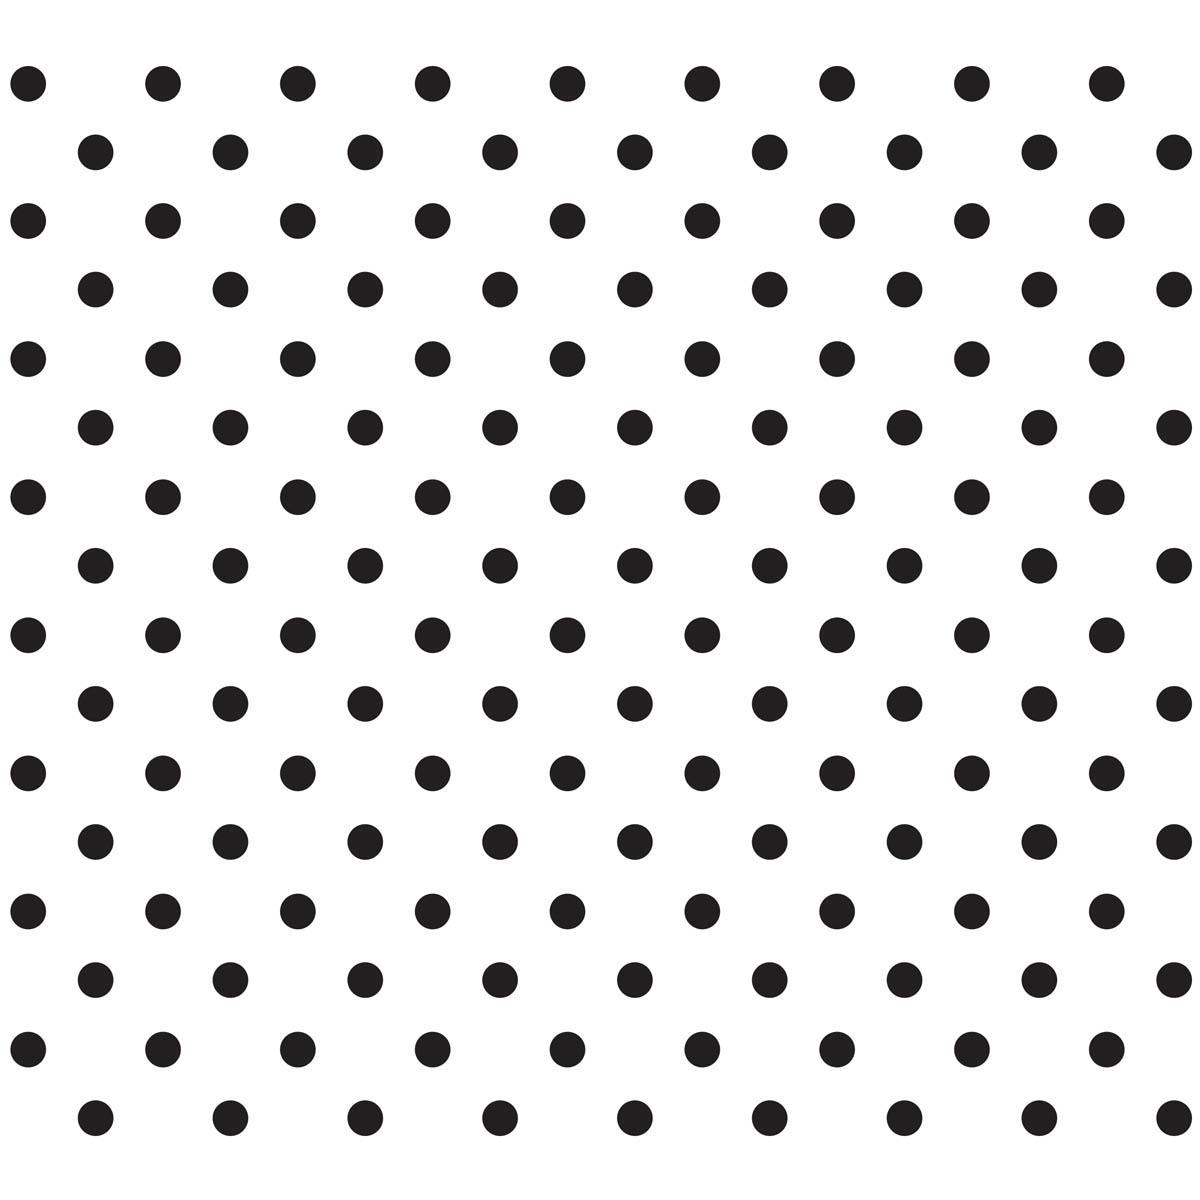 Waverly ® Inspirations Laser Stencils - Accent - Polka Dot, 6